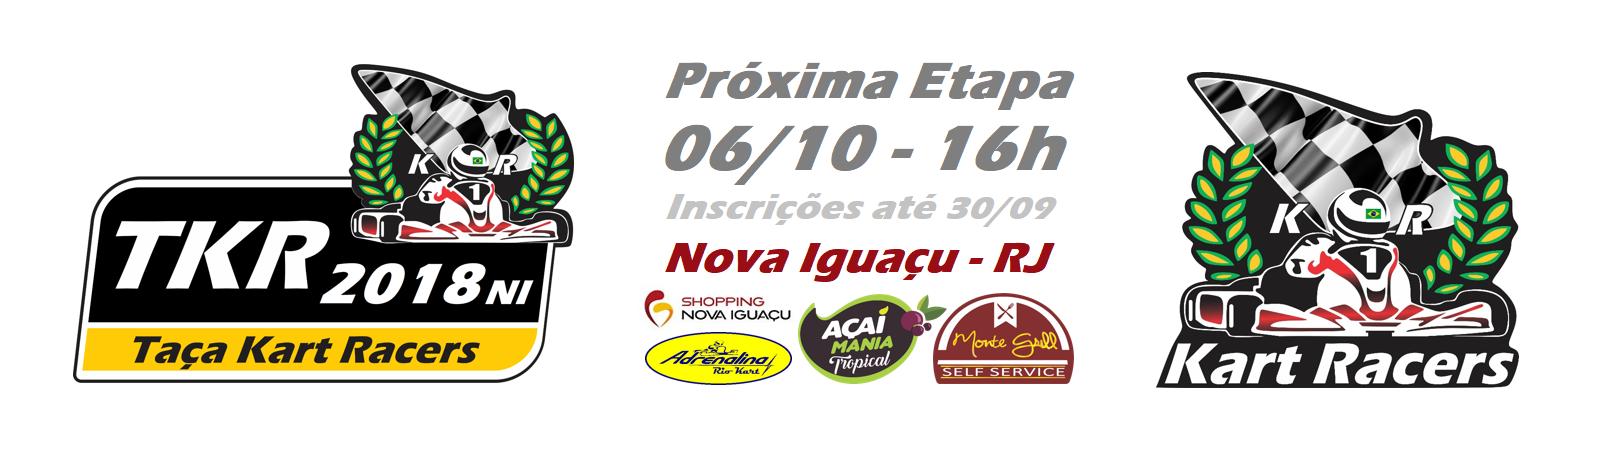 TAÇA KART RACERS 2018 Nova Iguaçu - TKR2018NI - Ver calendário